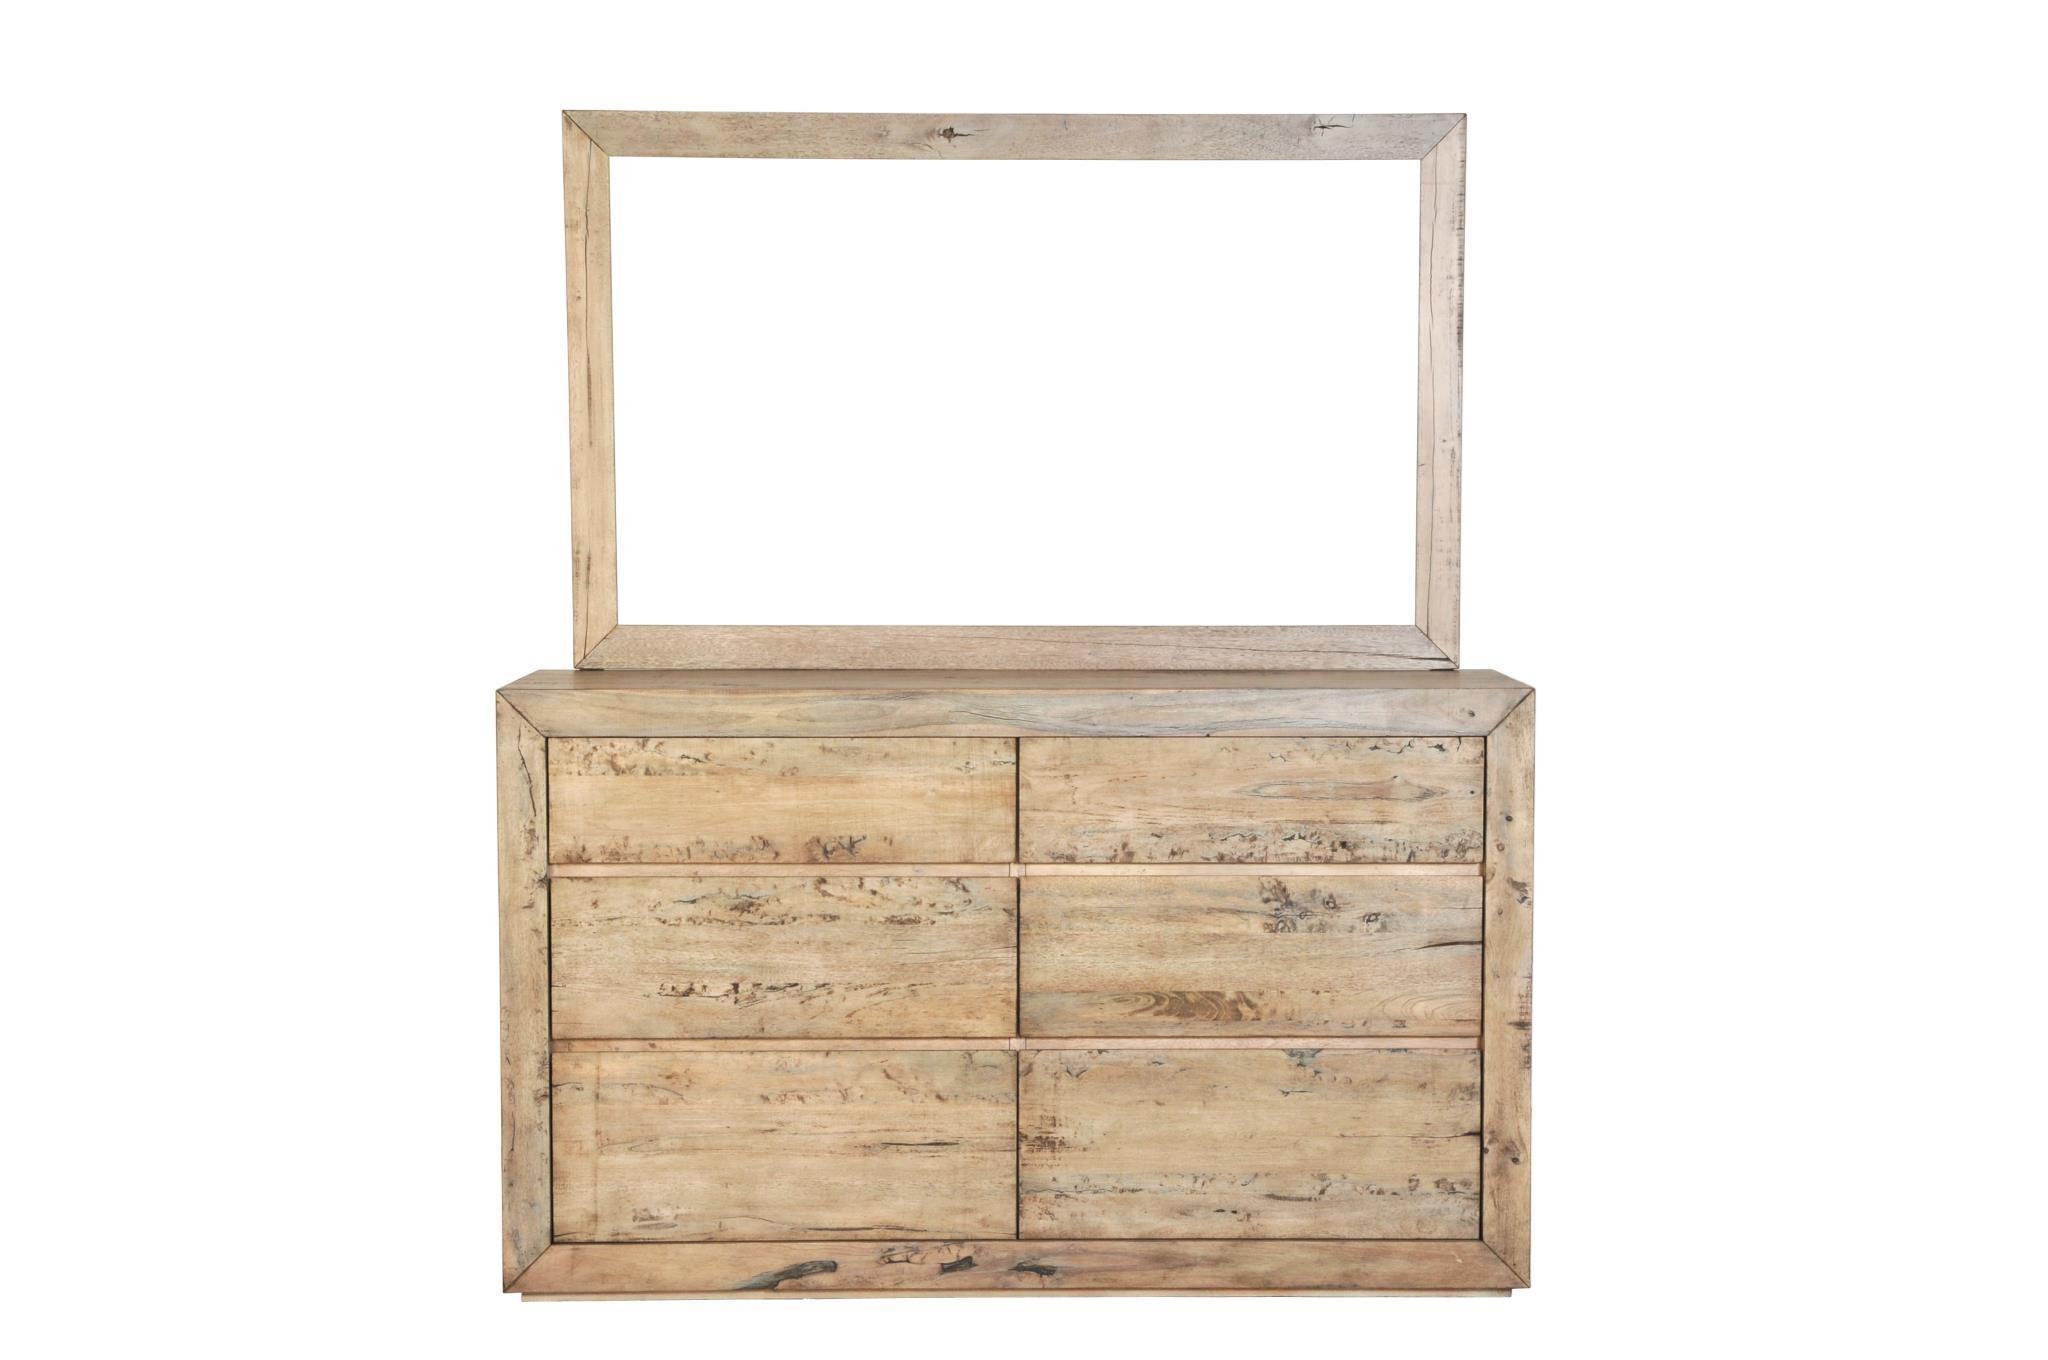 Napa Furniture Designs Renewal Mirror - Item Number: 200-14